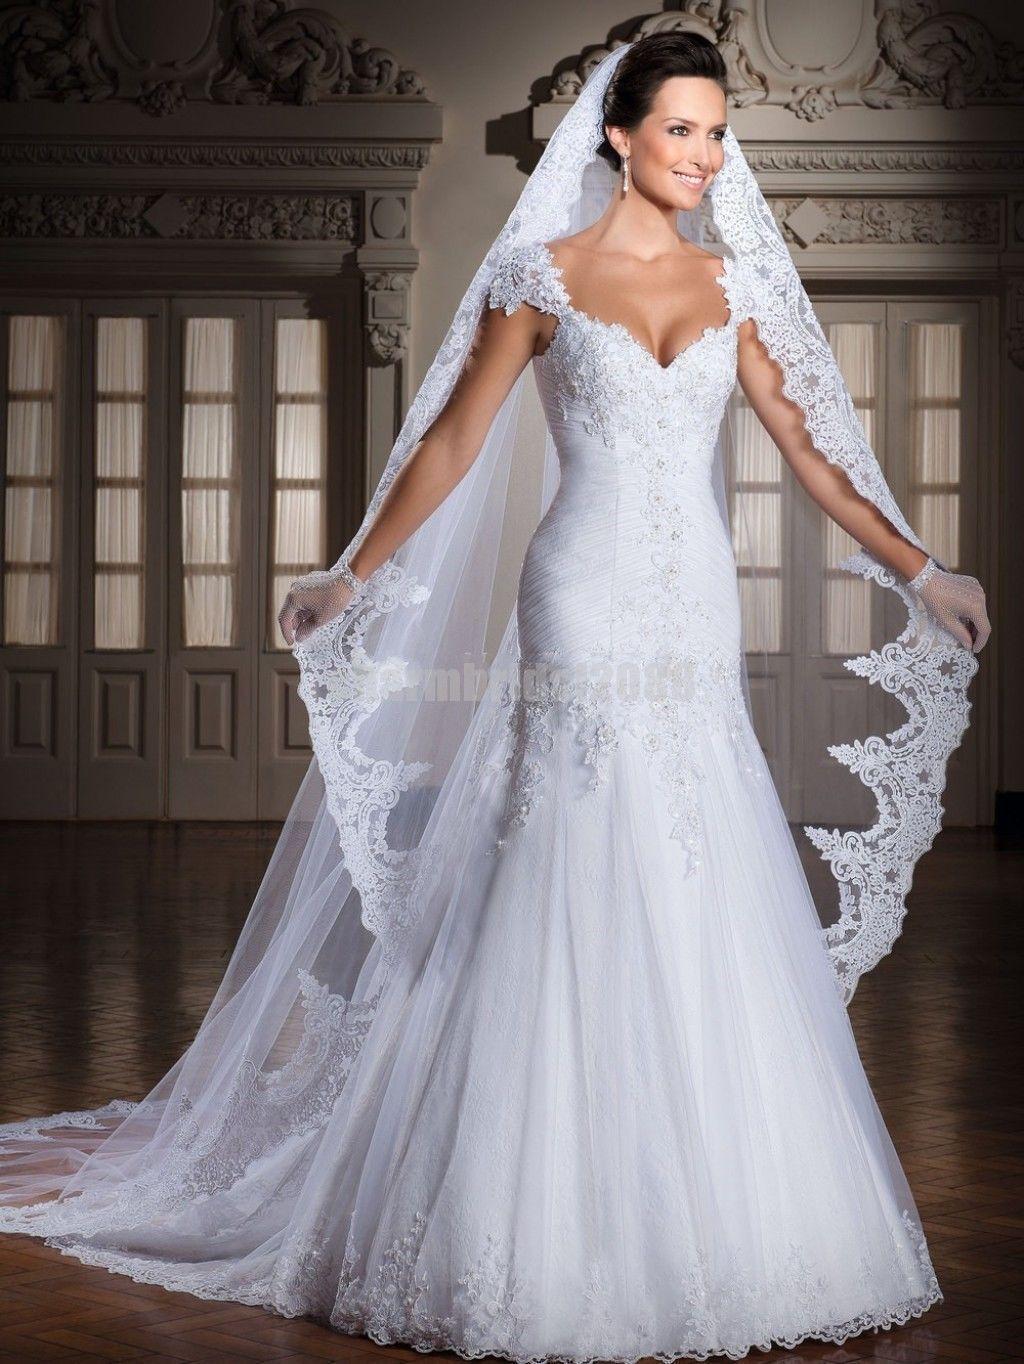 2015 New Elegant Lace Wedding Dress Illusion Cap Sleeve Open Back ...